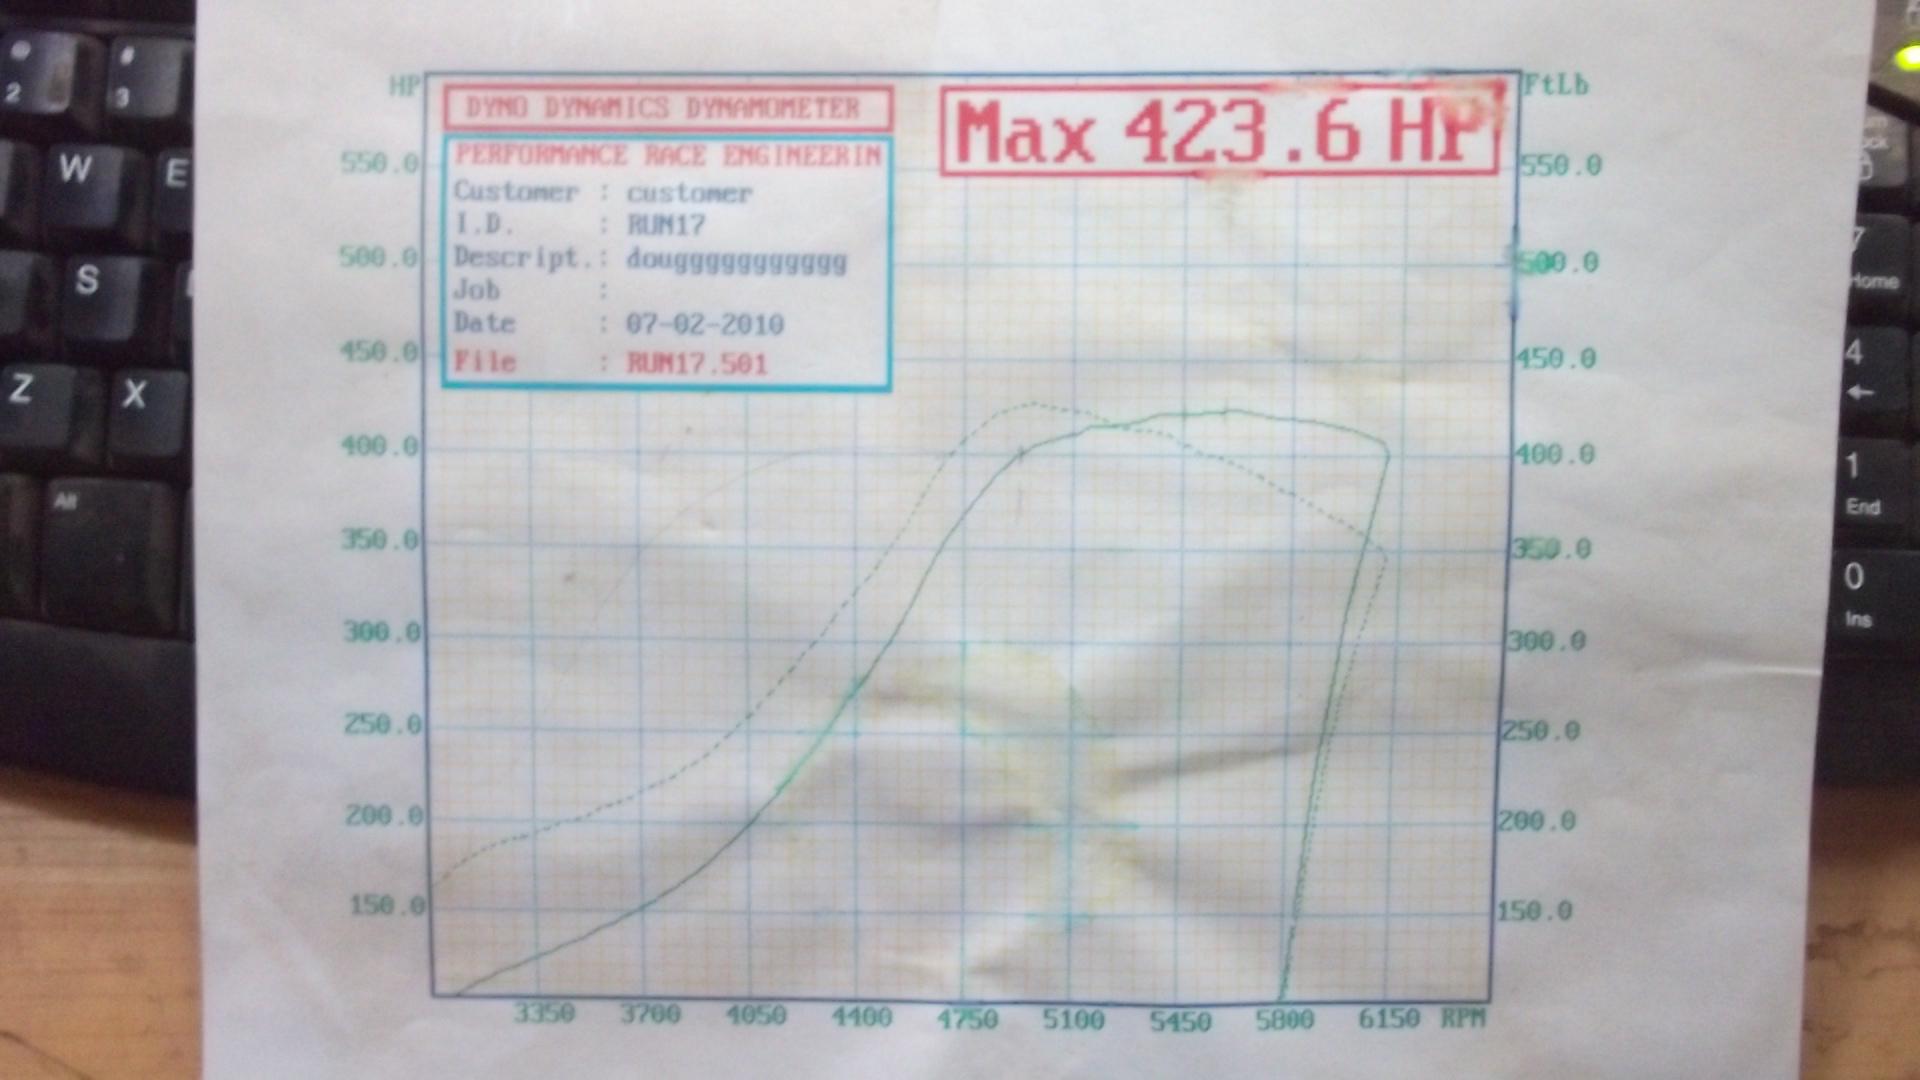 Subaru Legacy Dyno Graph Results